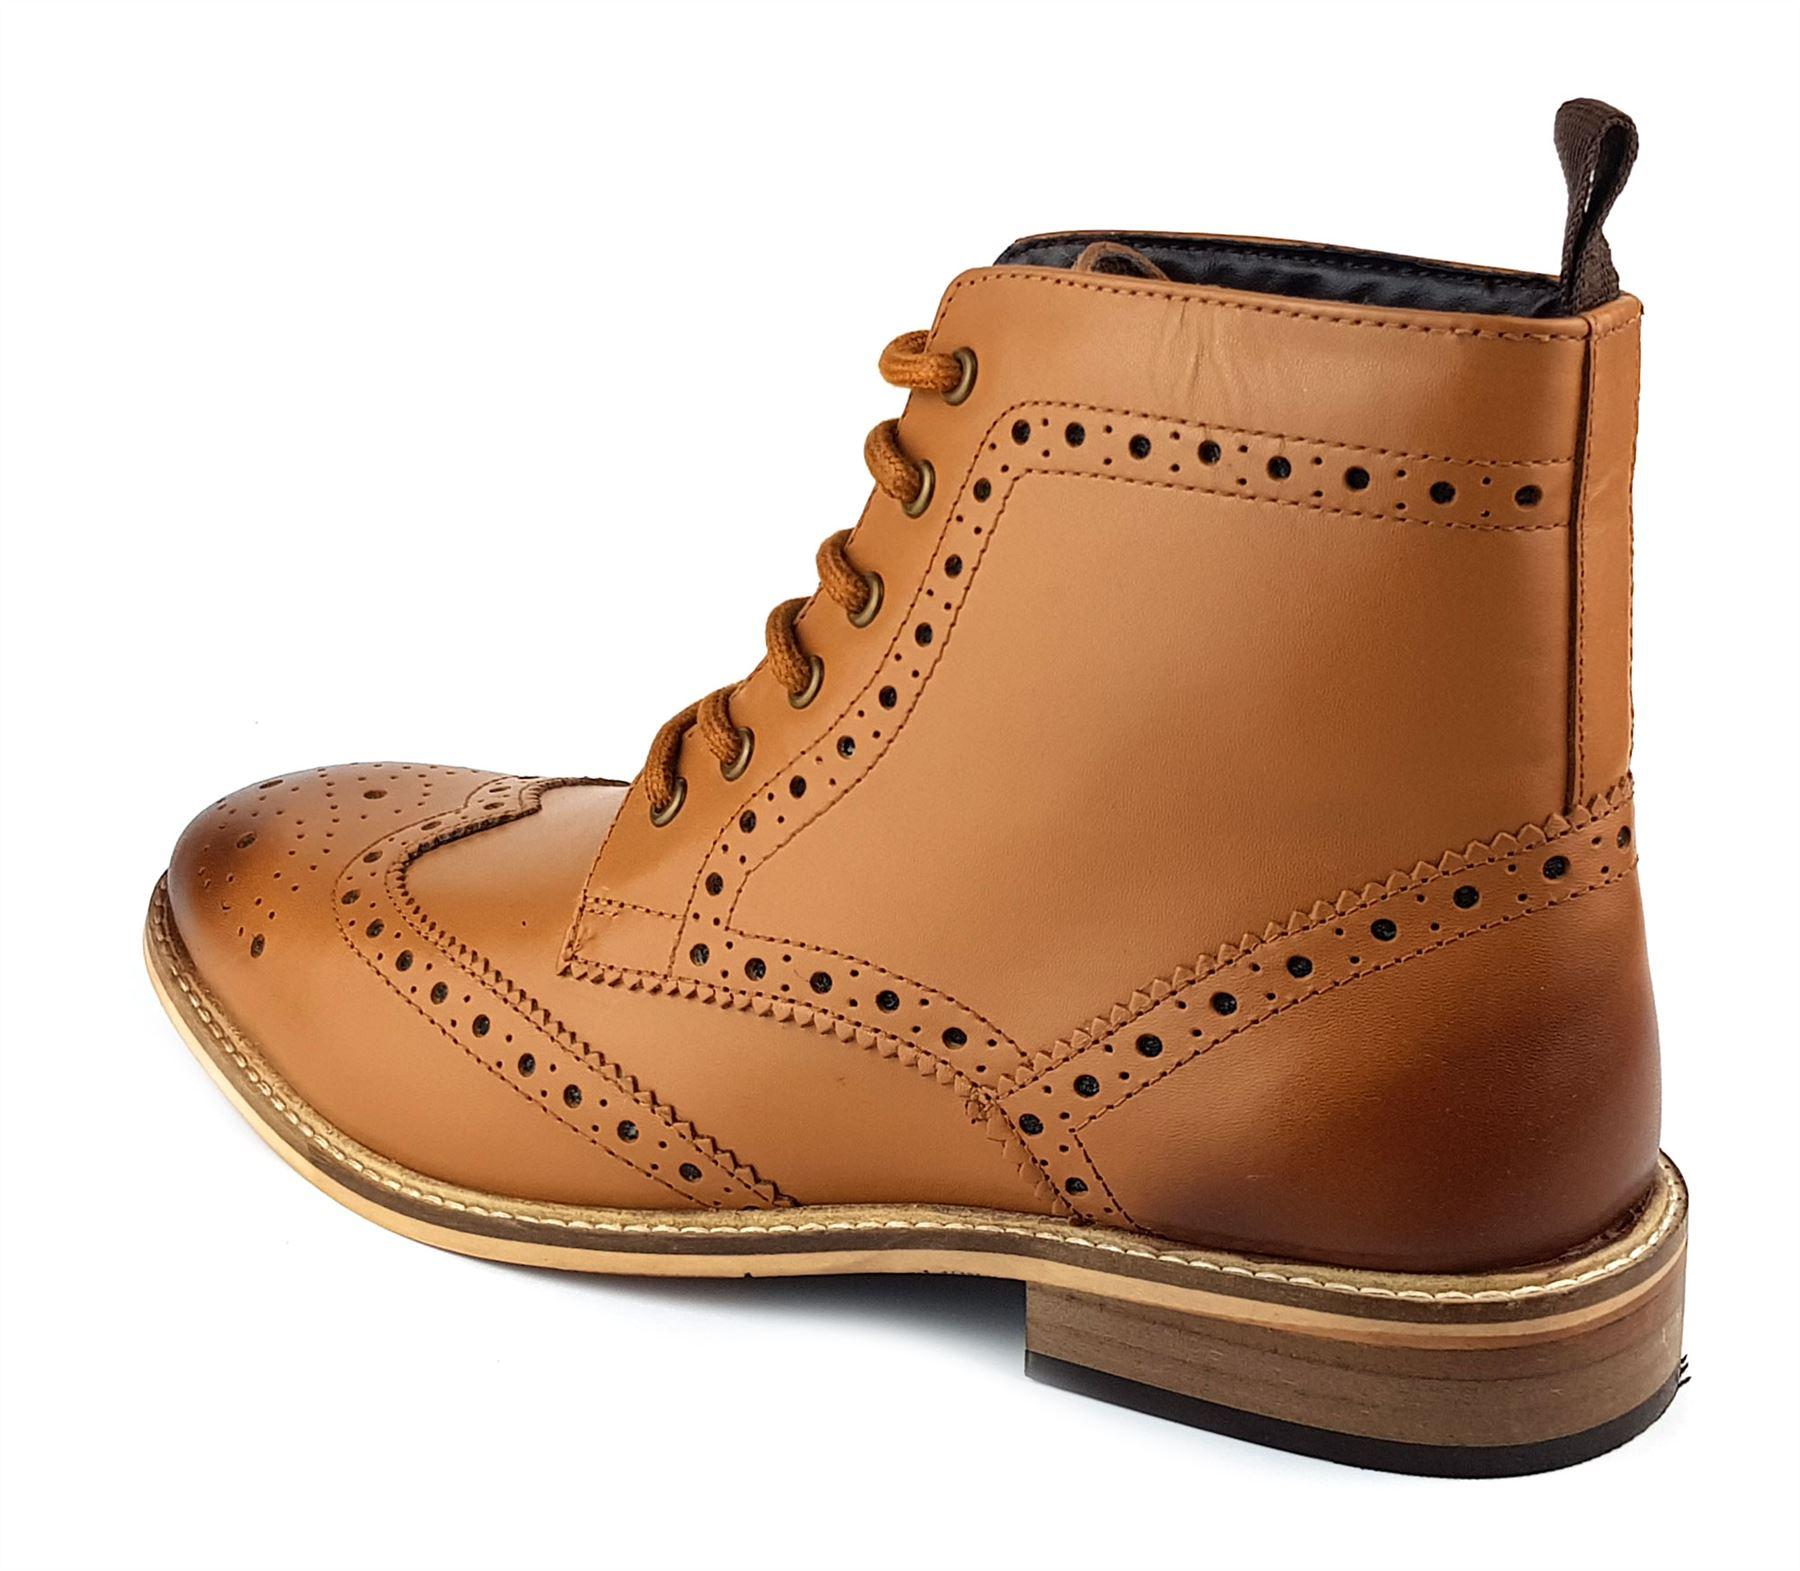 Frank James Kensington Mens Lace Brogue Leather Boots Tan White Navy